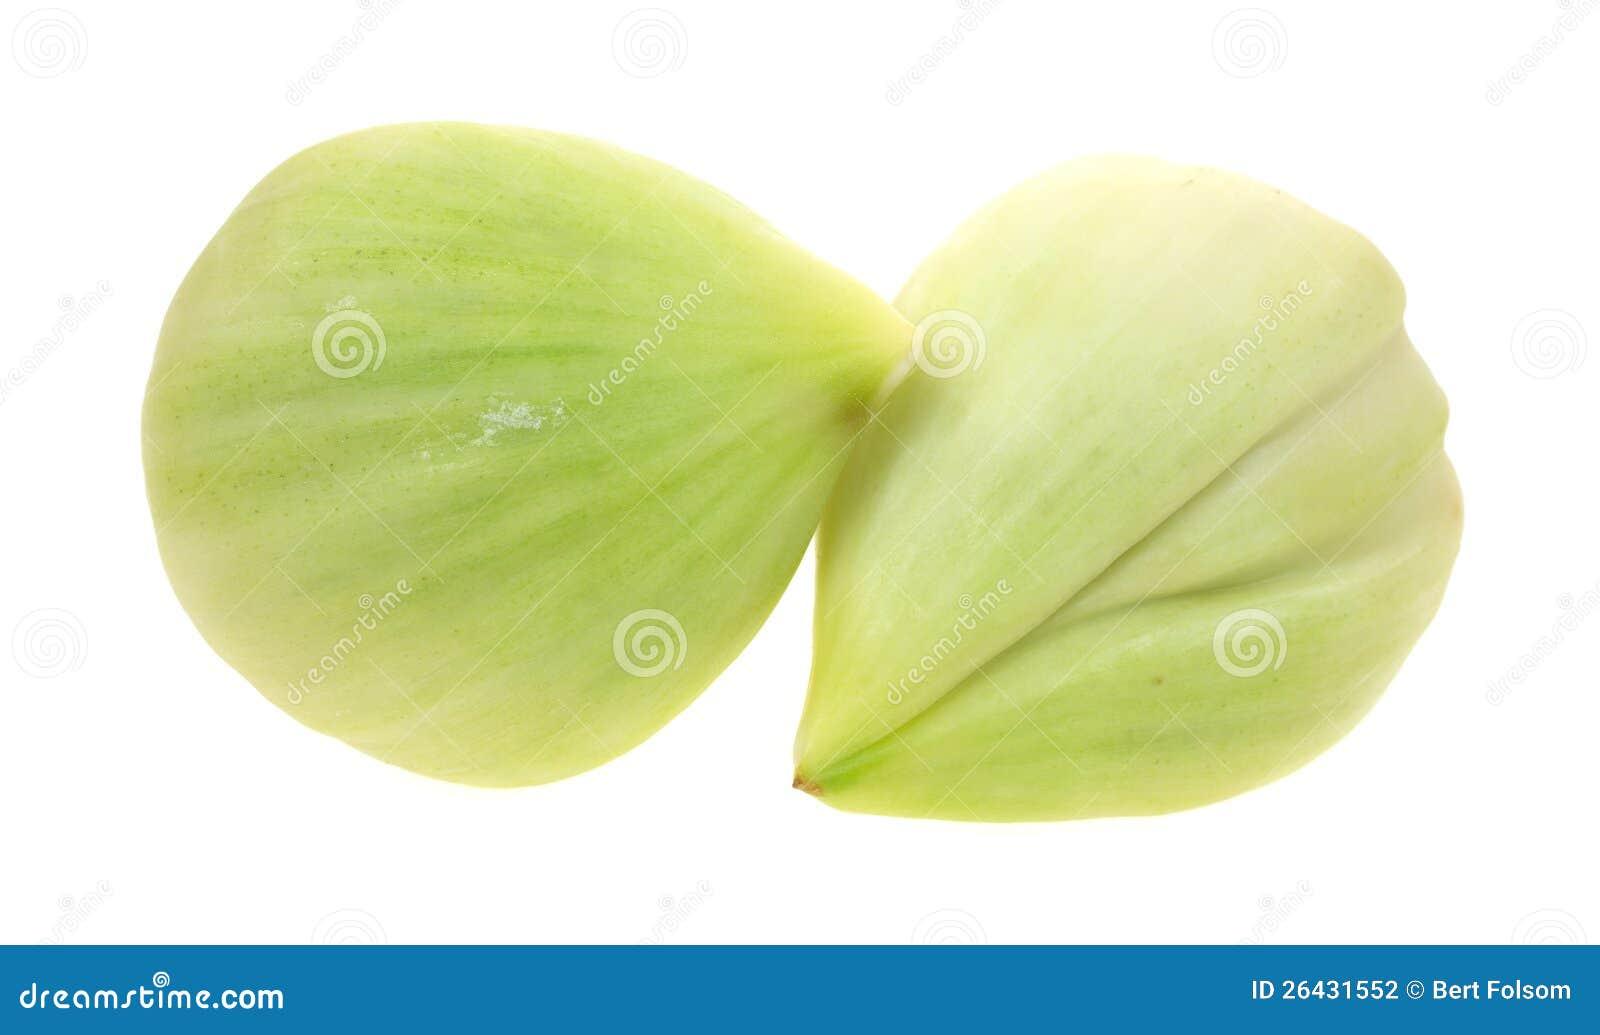 Two elephant garlic cloves